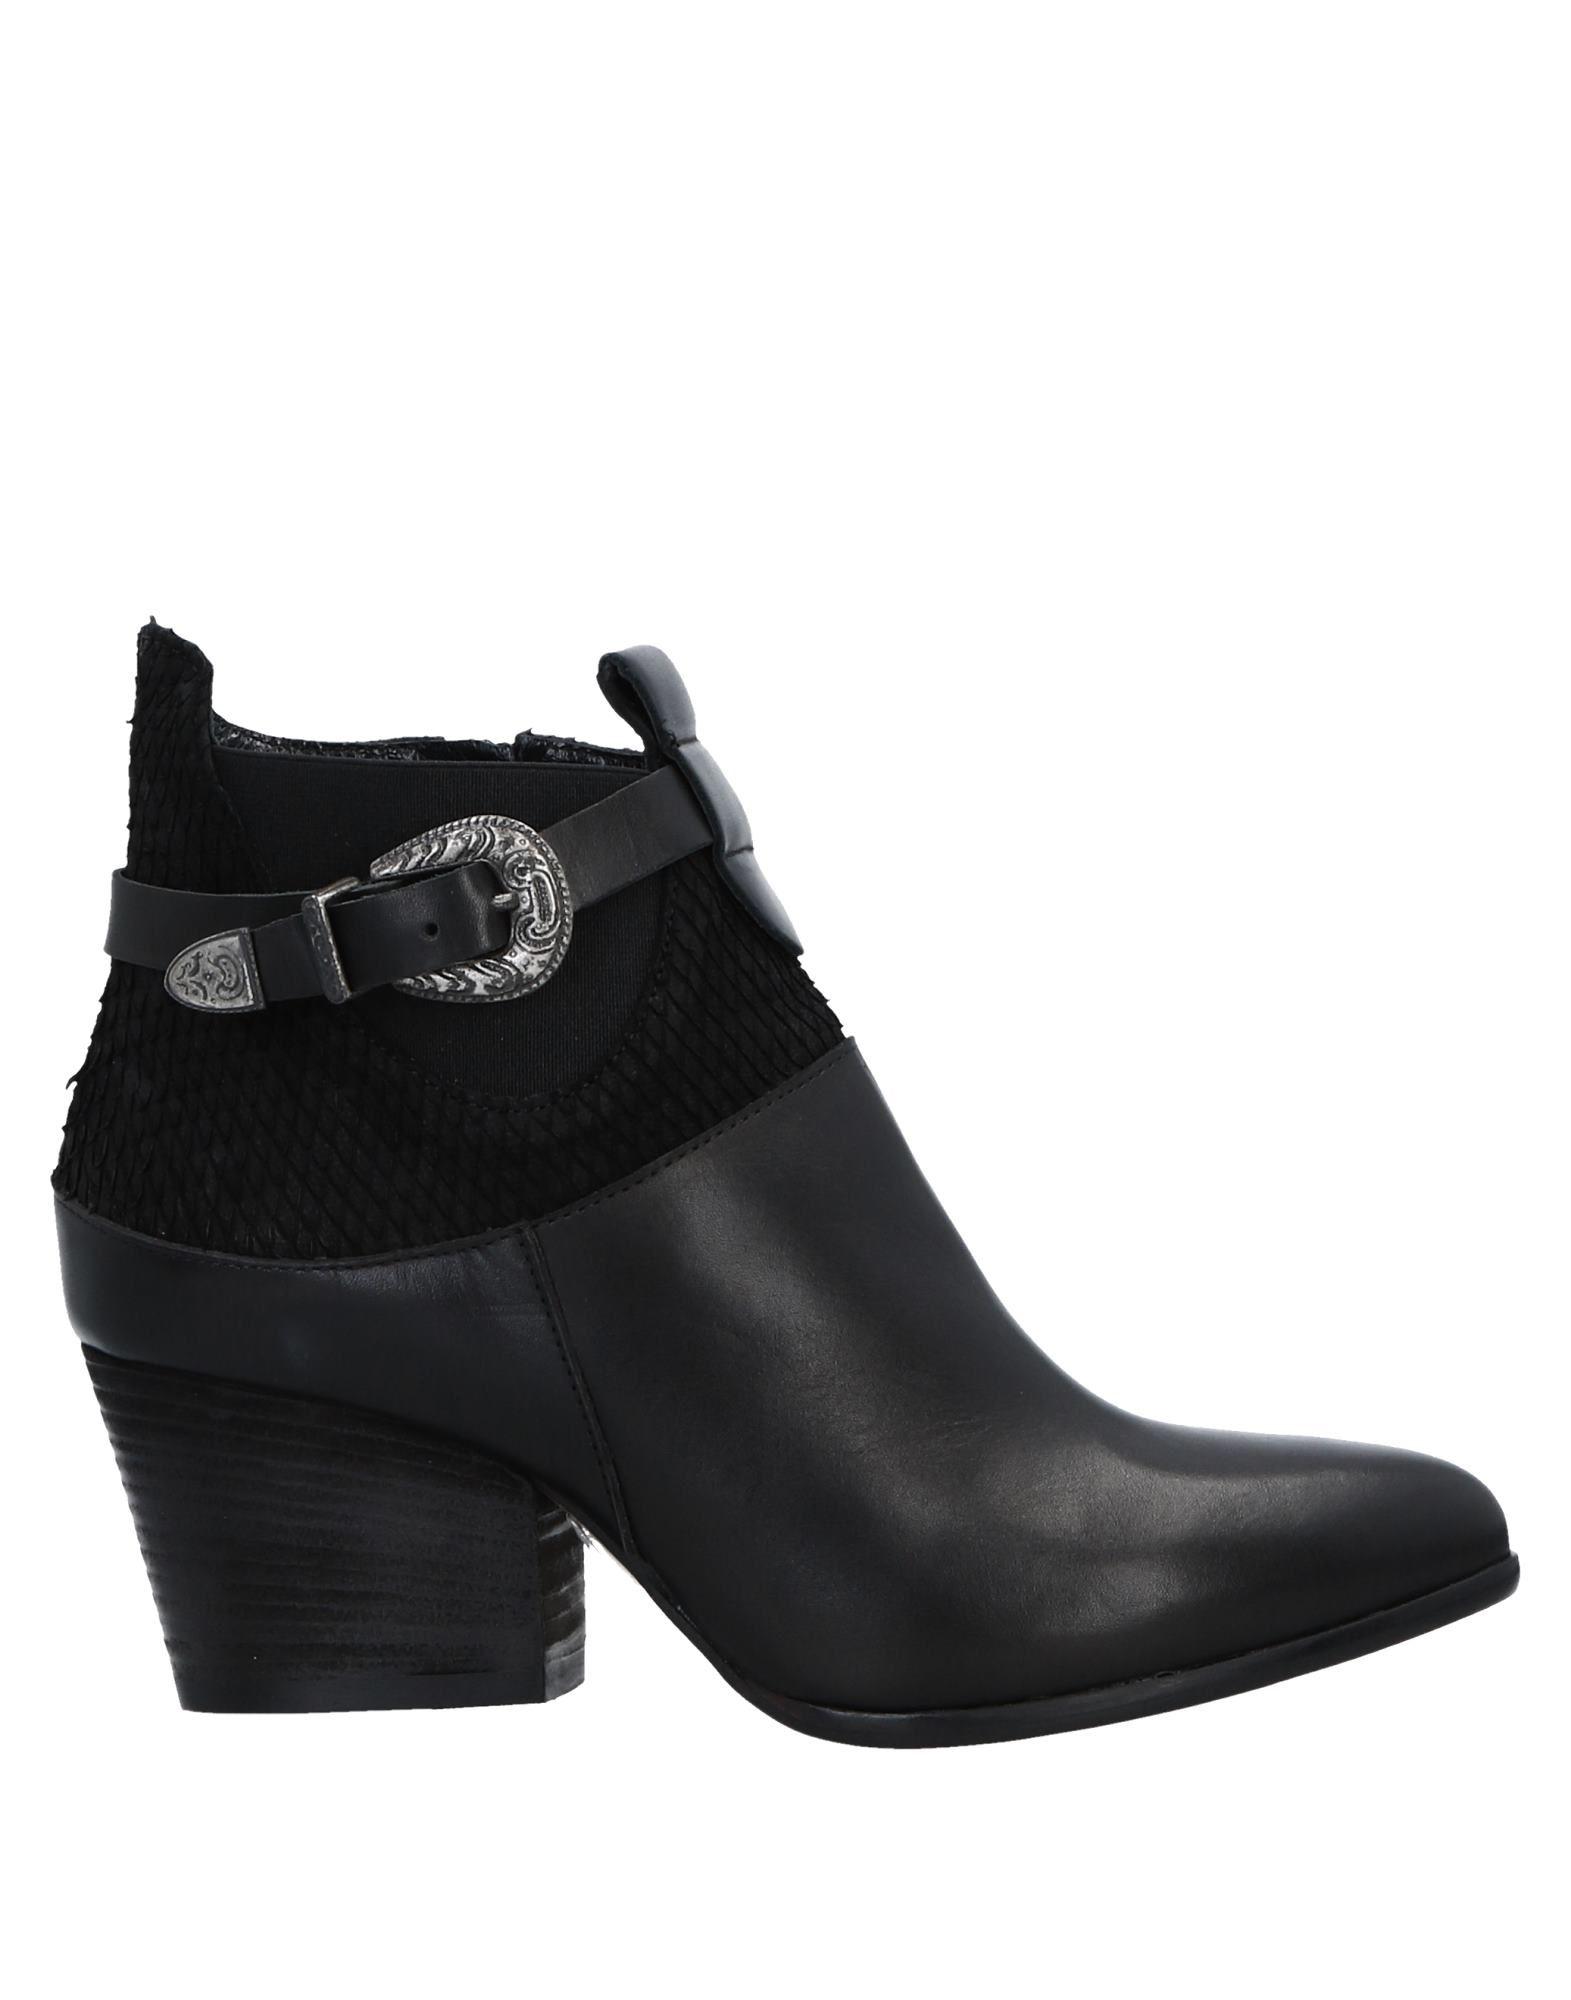 Moda Stivaletti Mivida Donna - 11512184HH